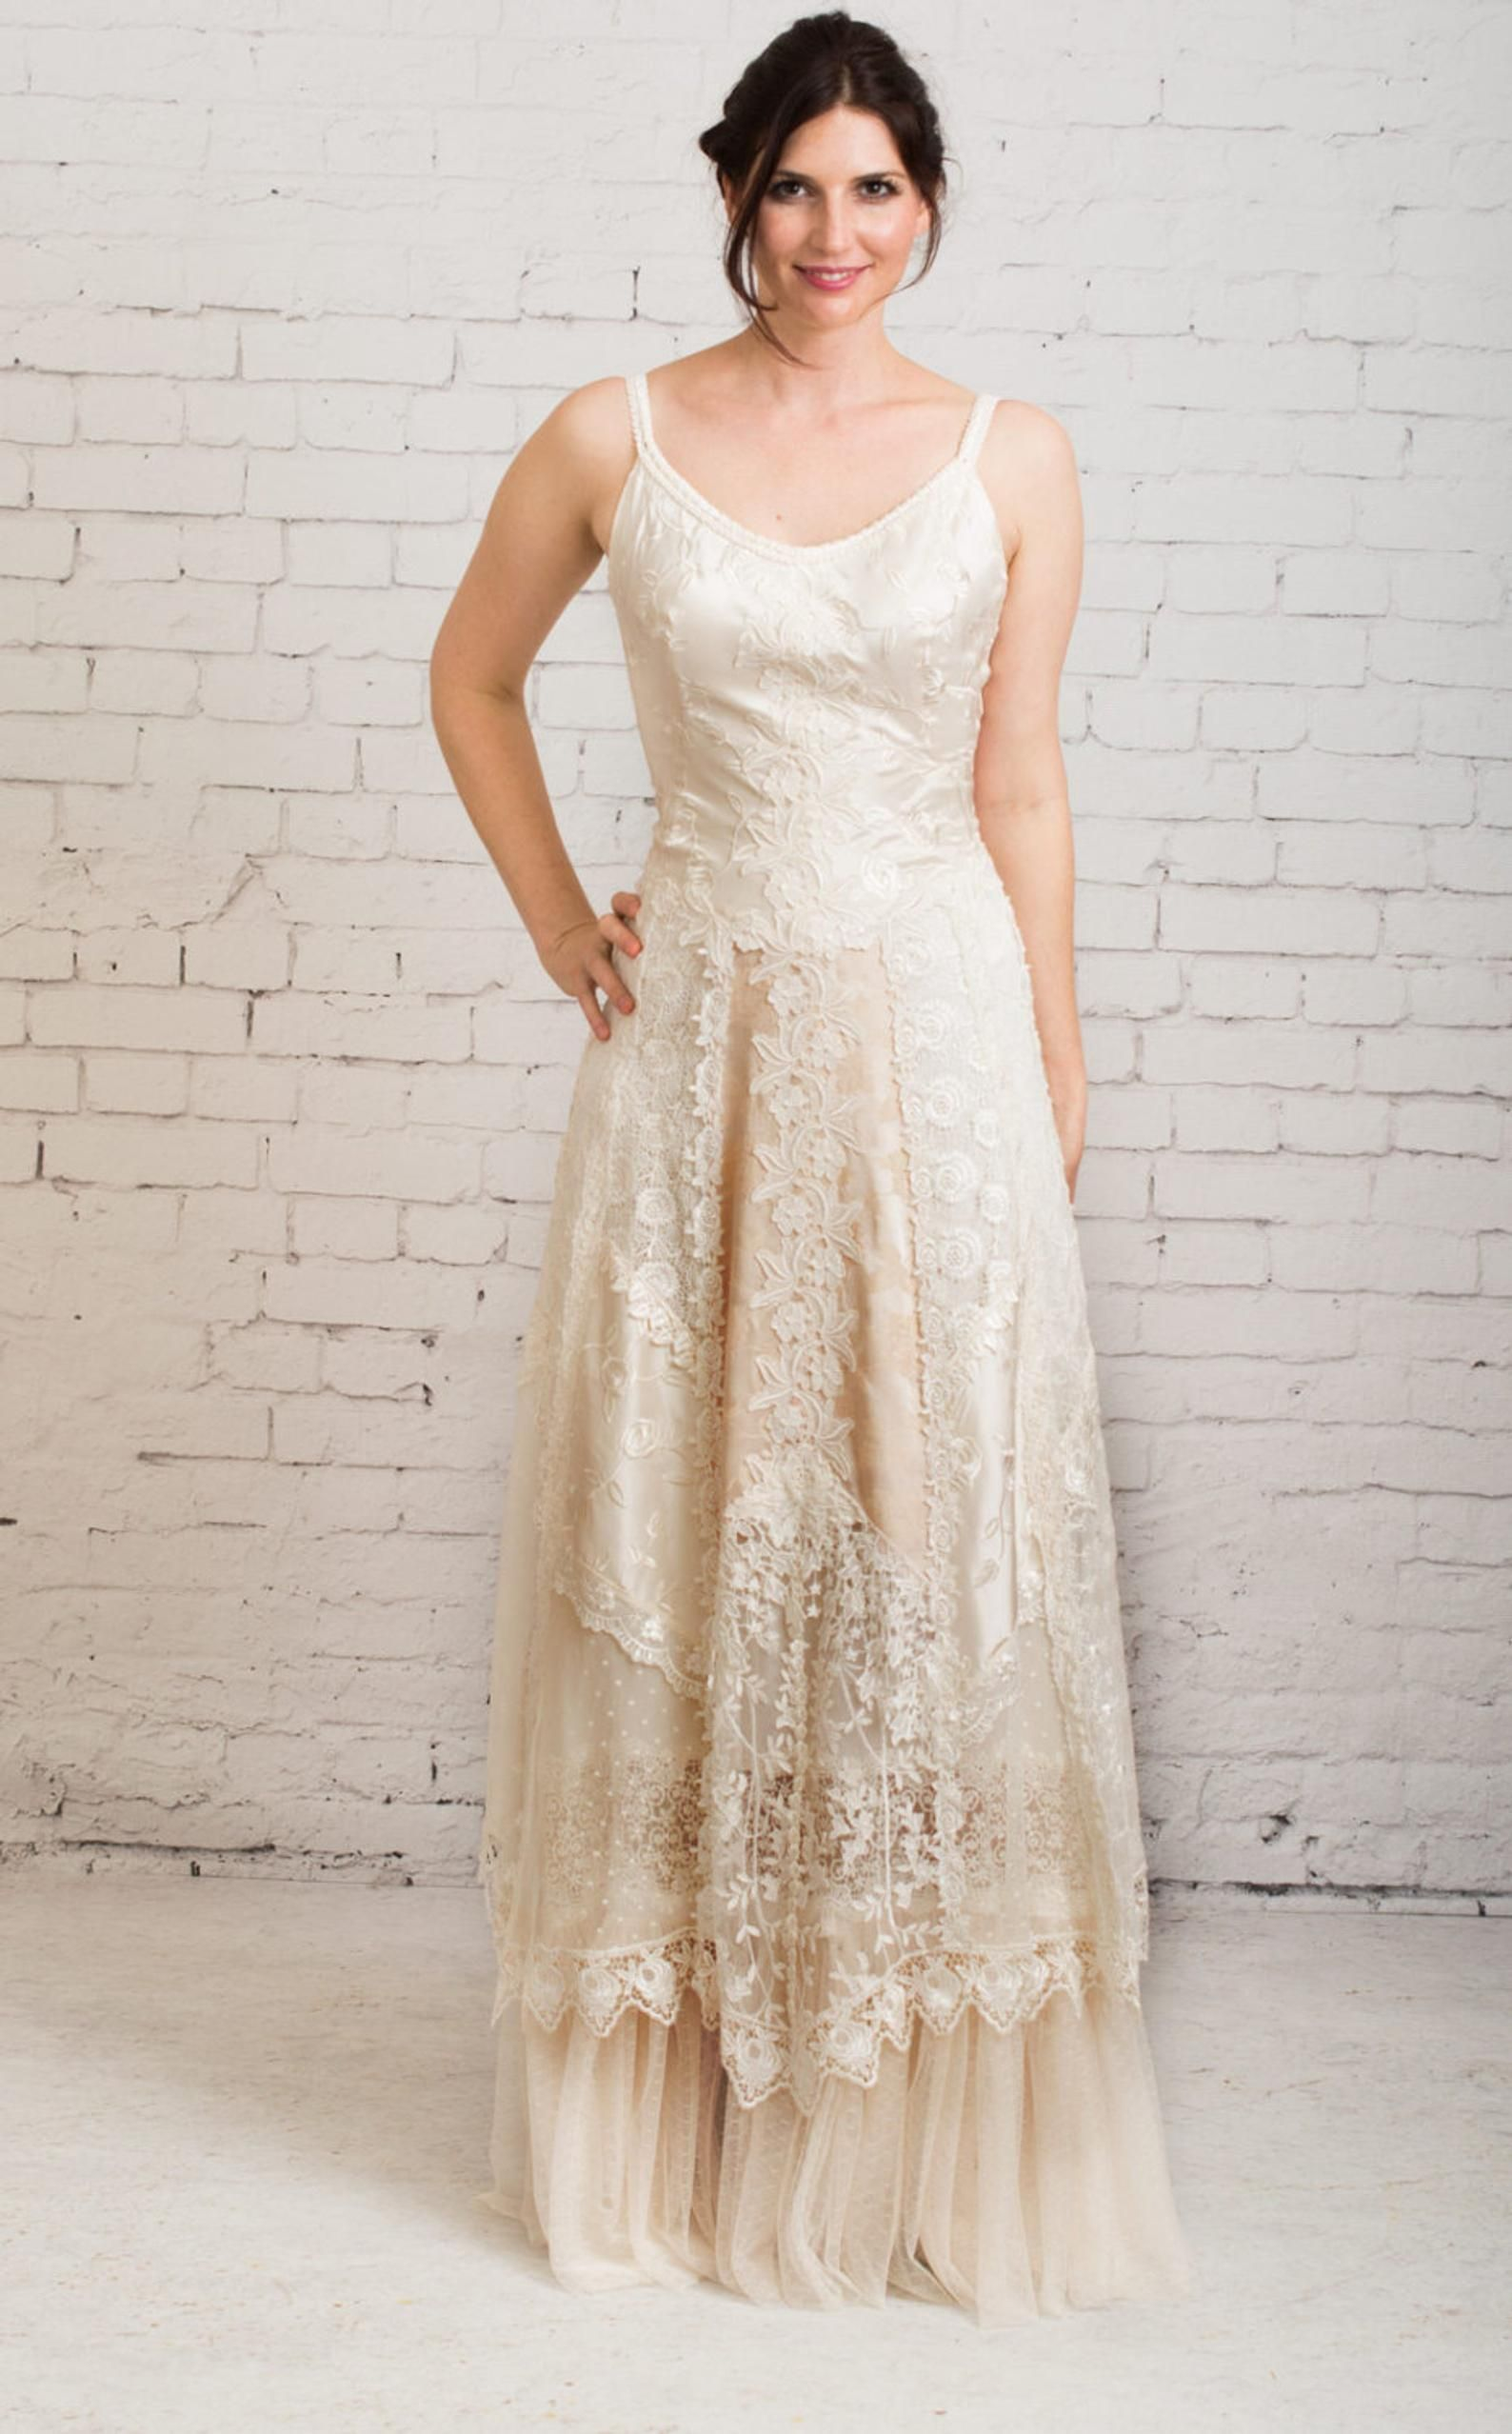 Boho Wedding Dress Casual Wedding Dress Simple Wedding Dress Rustic Wedding Dress Back Casual Wedding Dress Cheap Wedding Dress Simple Wedding Dress Casual [ 2556 x 1588 Pixel ]